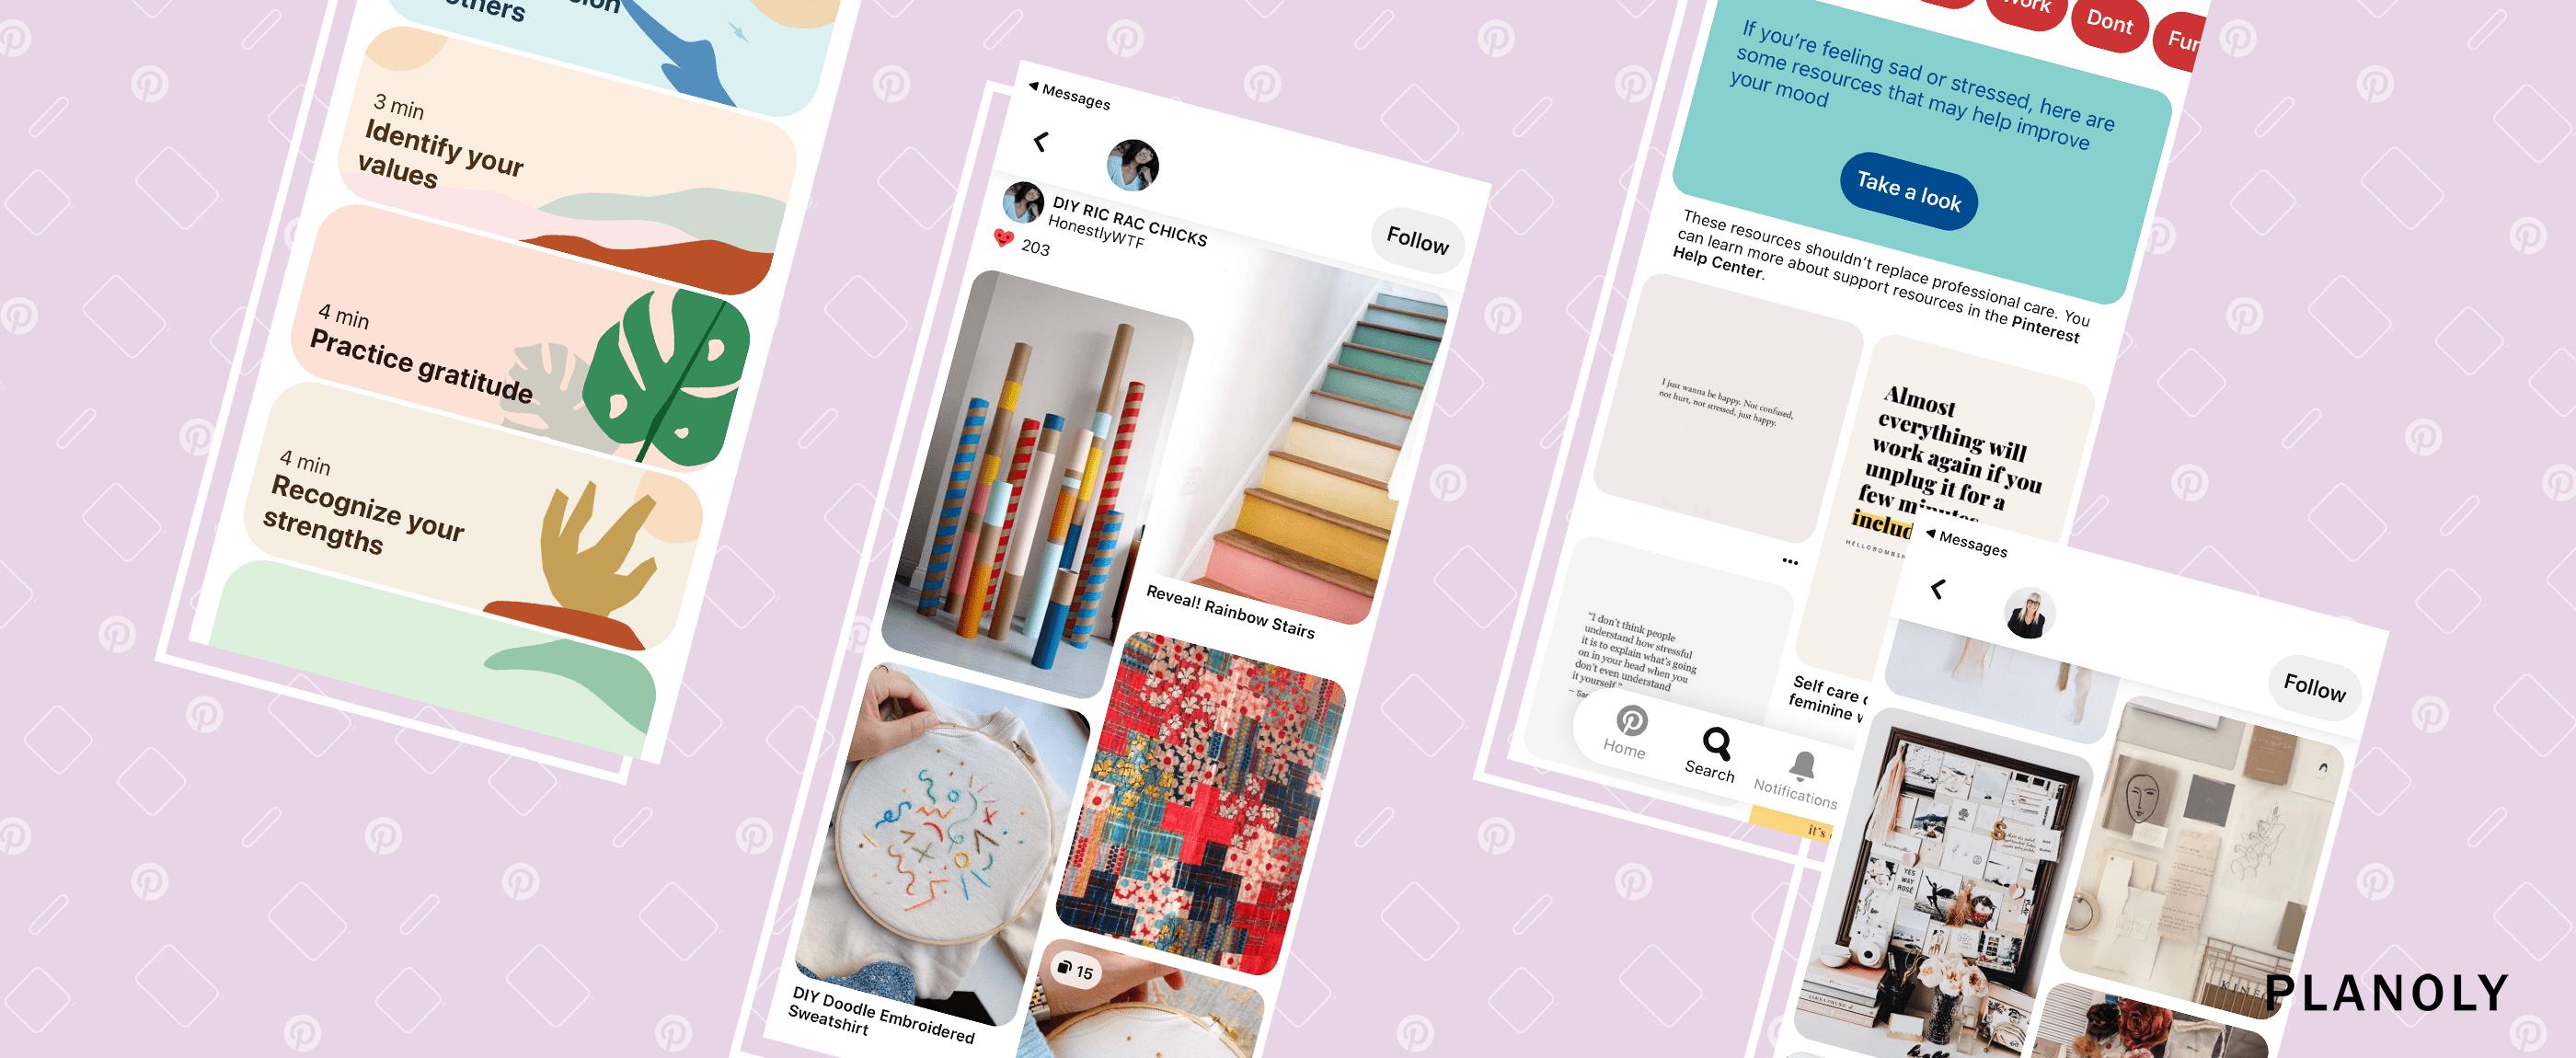 Is Pinterest the Last Positive Space Left Online?